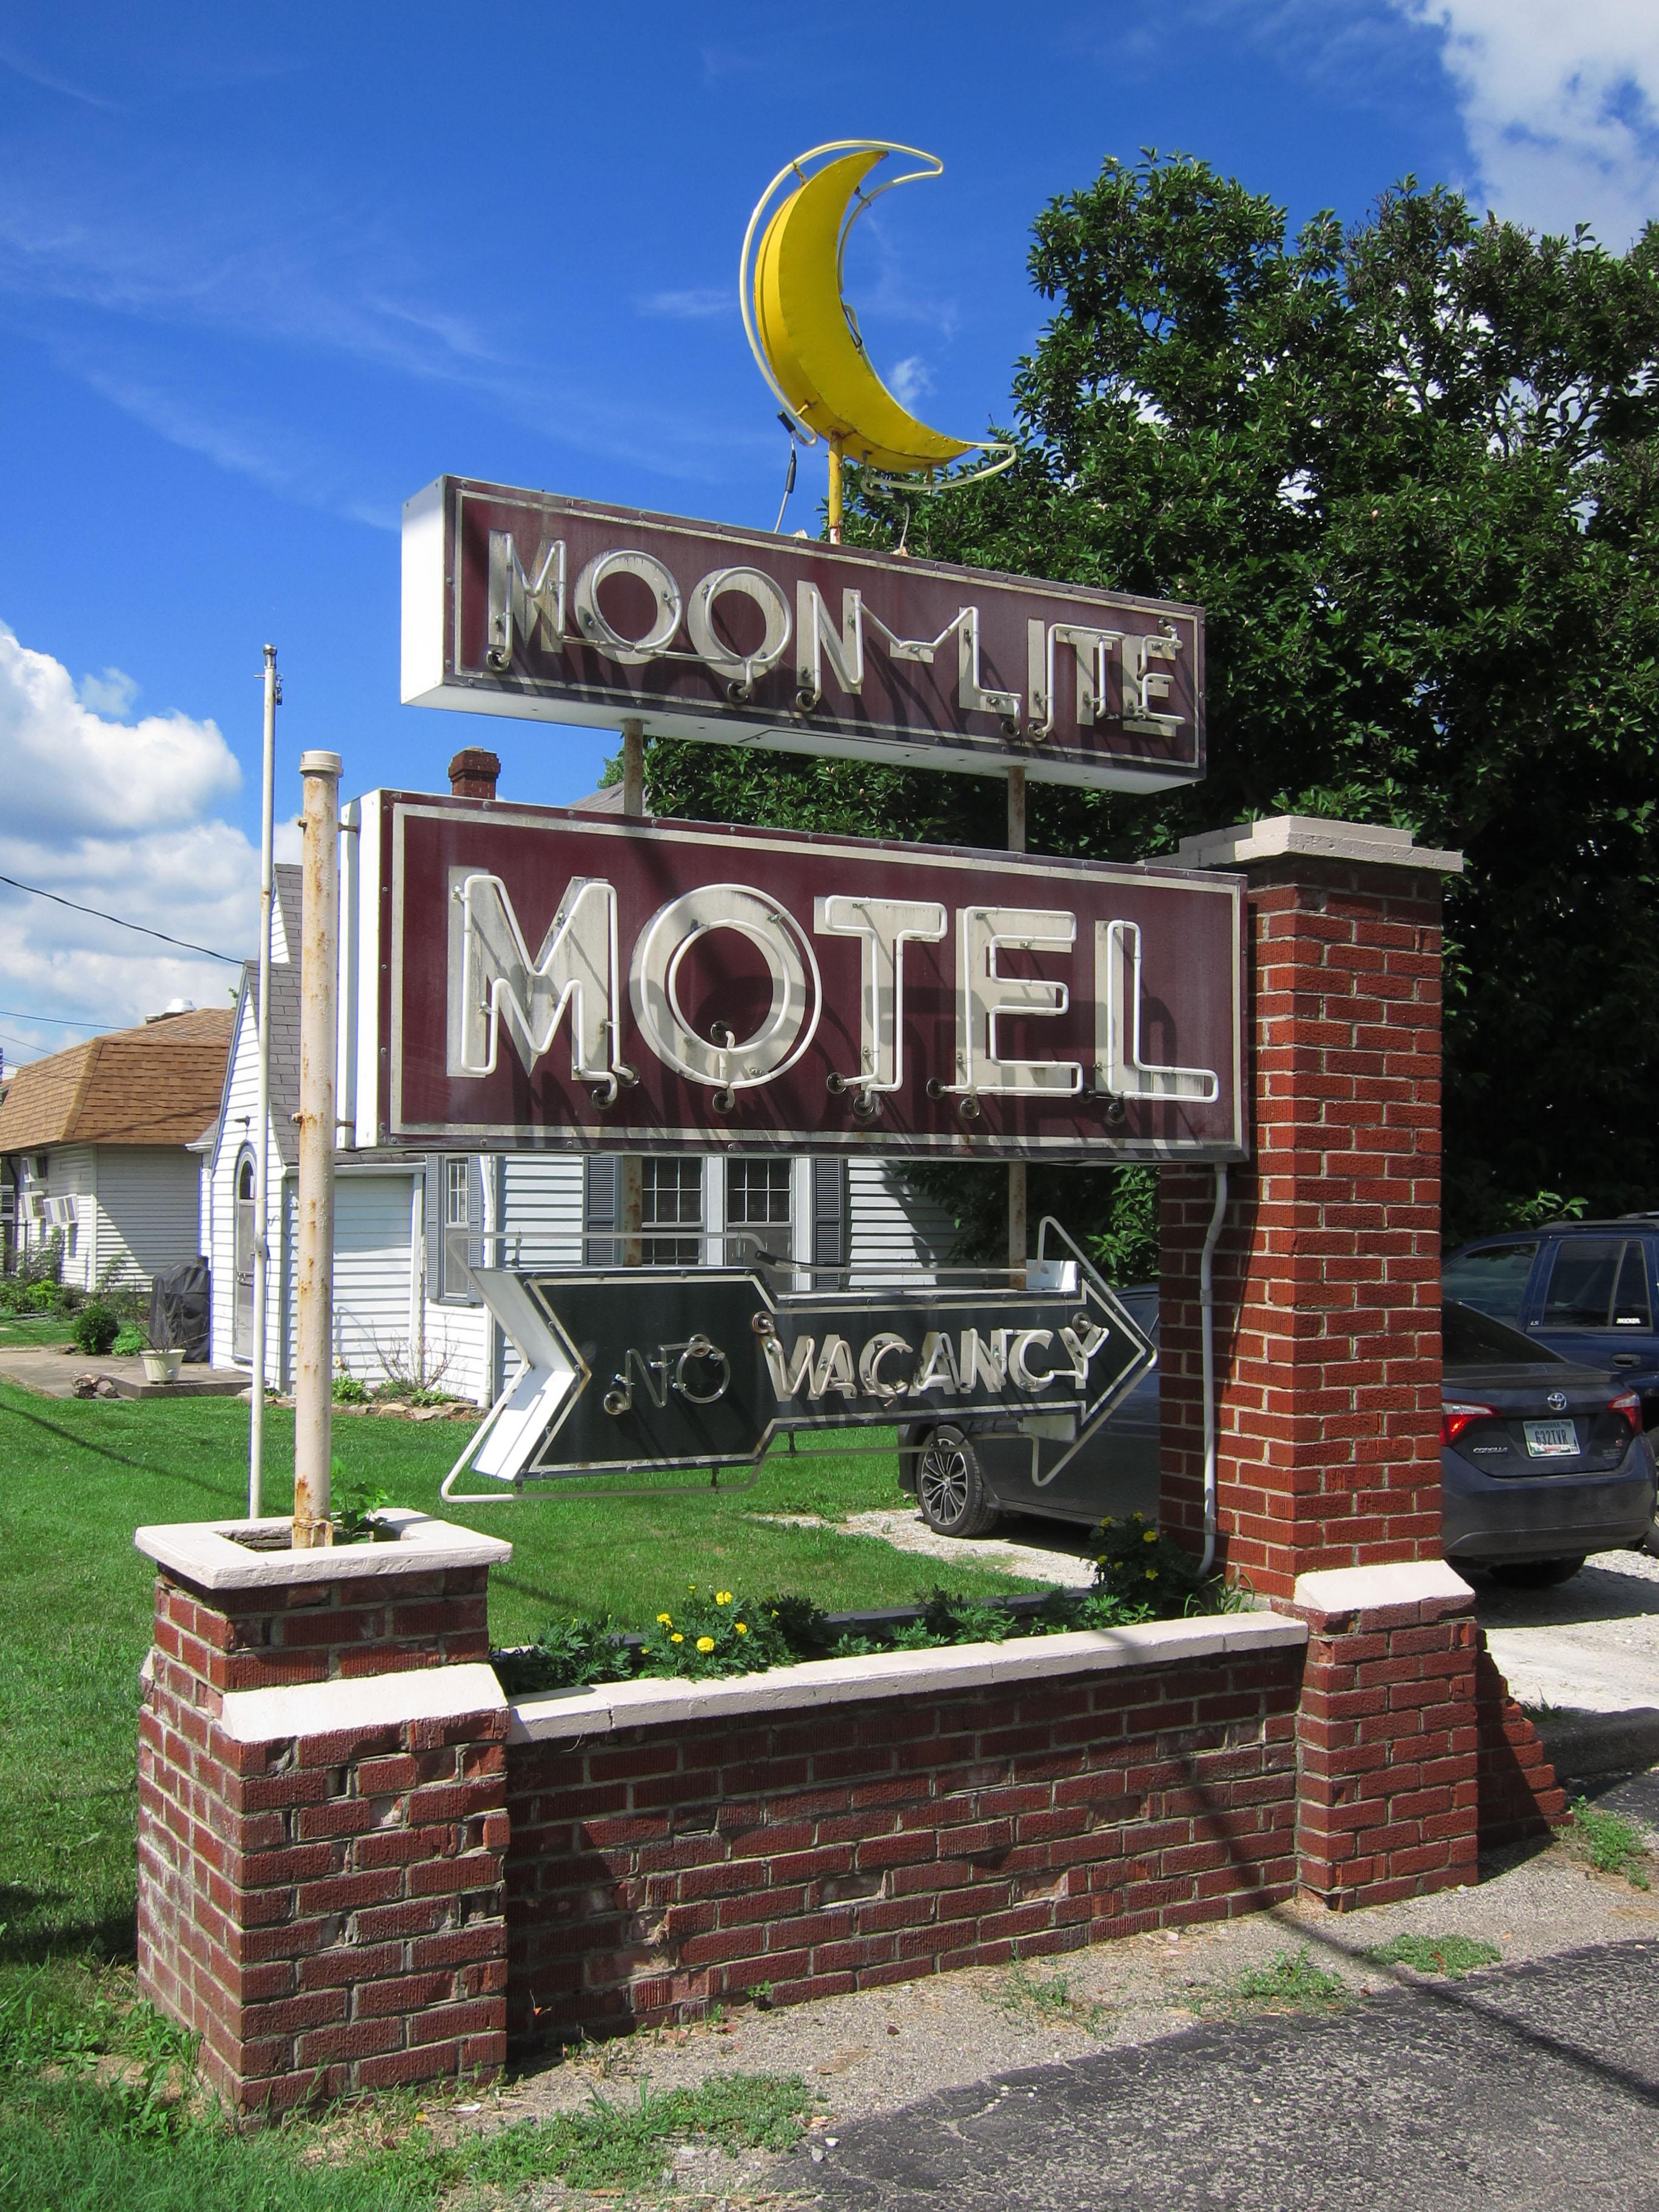 Moon-Lite Motel - 520 South Adams Street, Versailles, Indiana U.S.A. - July 6, 2018